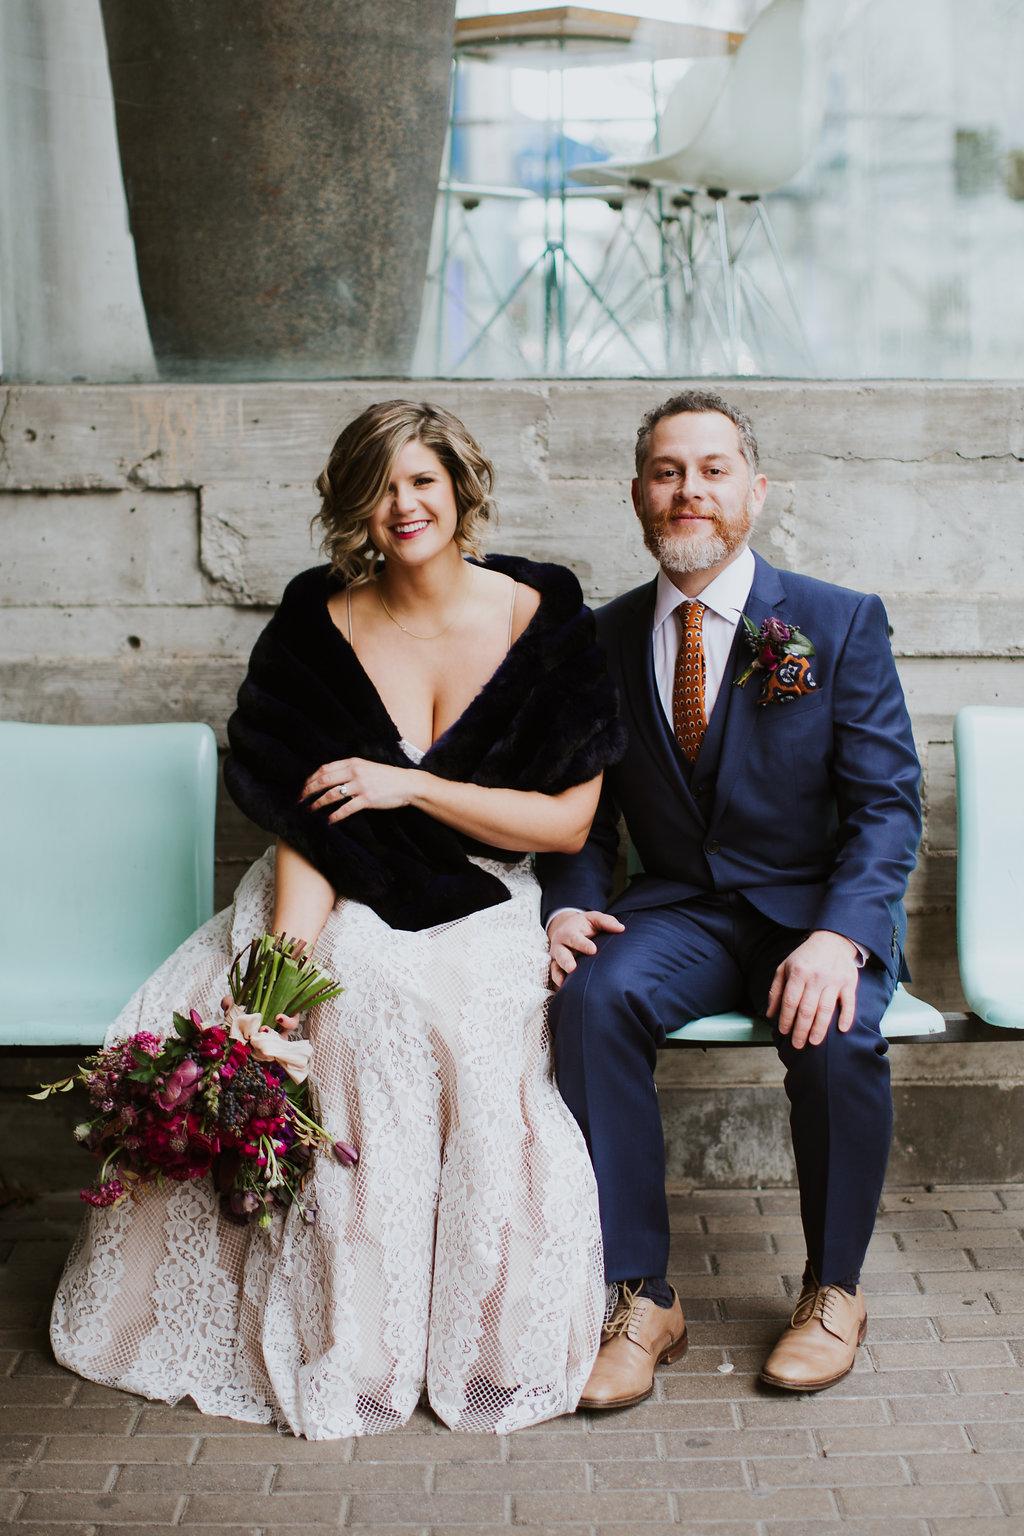 Paige-Newton-Intimate-Wedding-Photographer-Malverde-Wedding-Photography0026.jpg